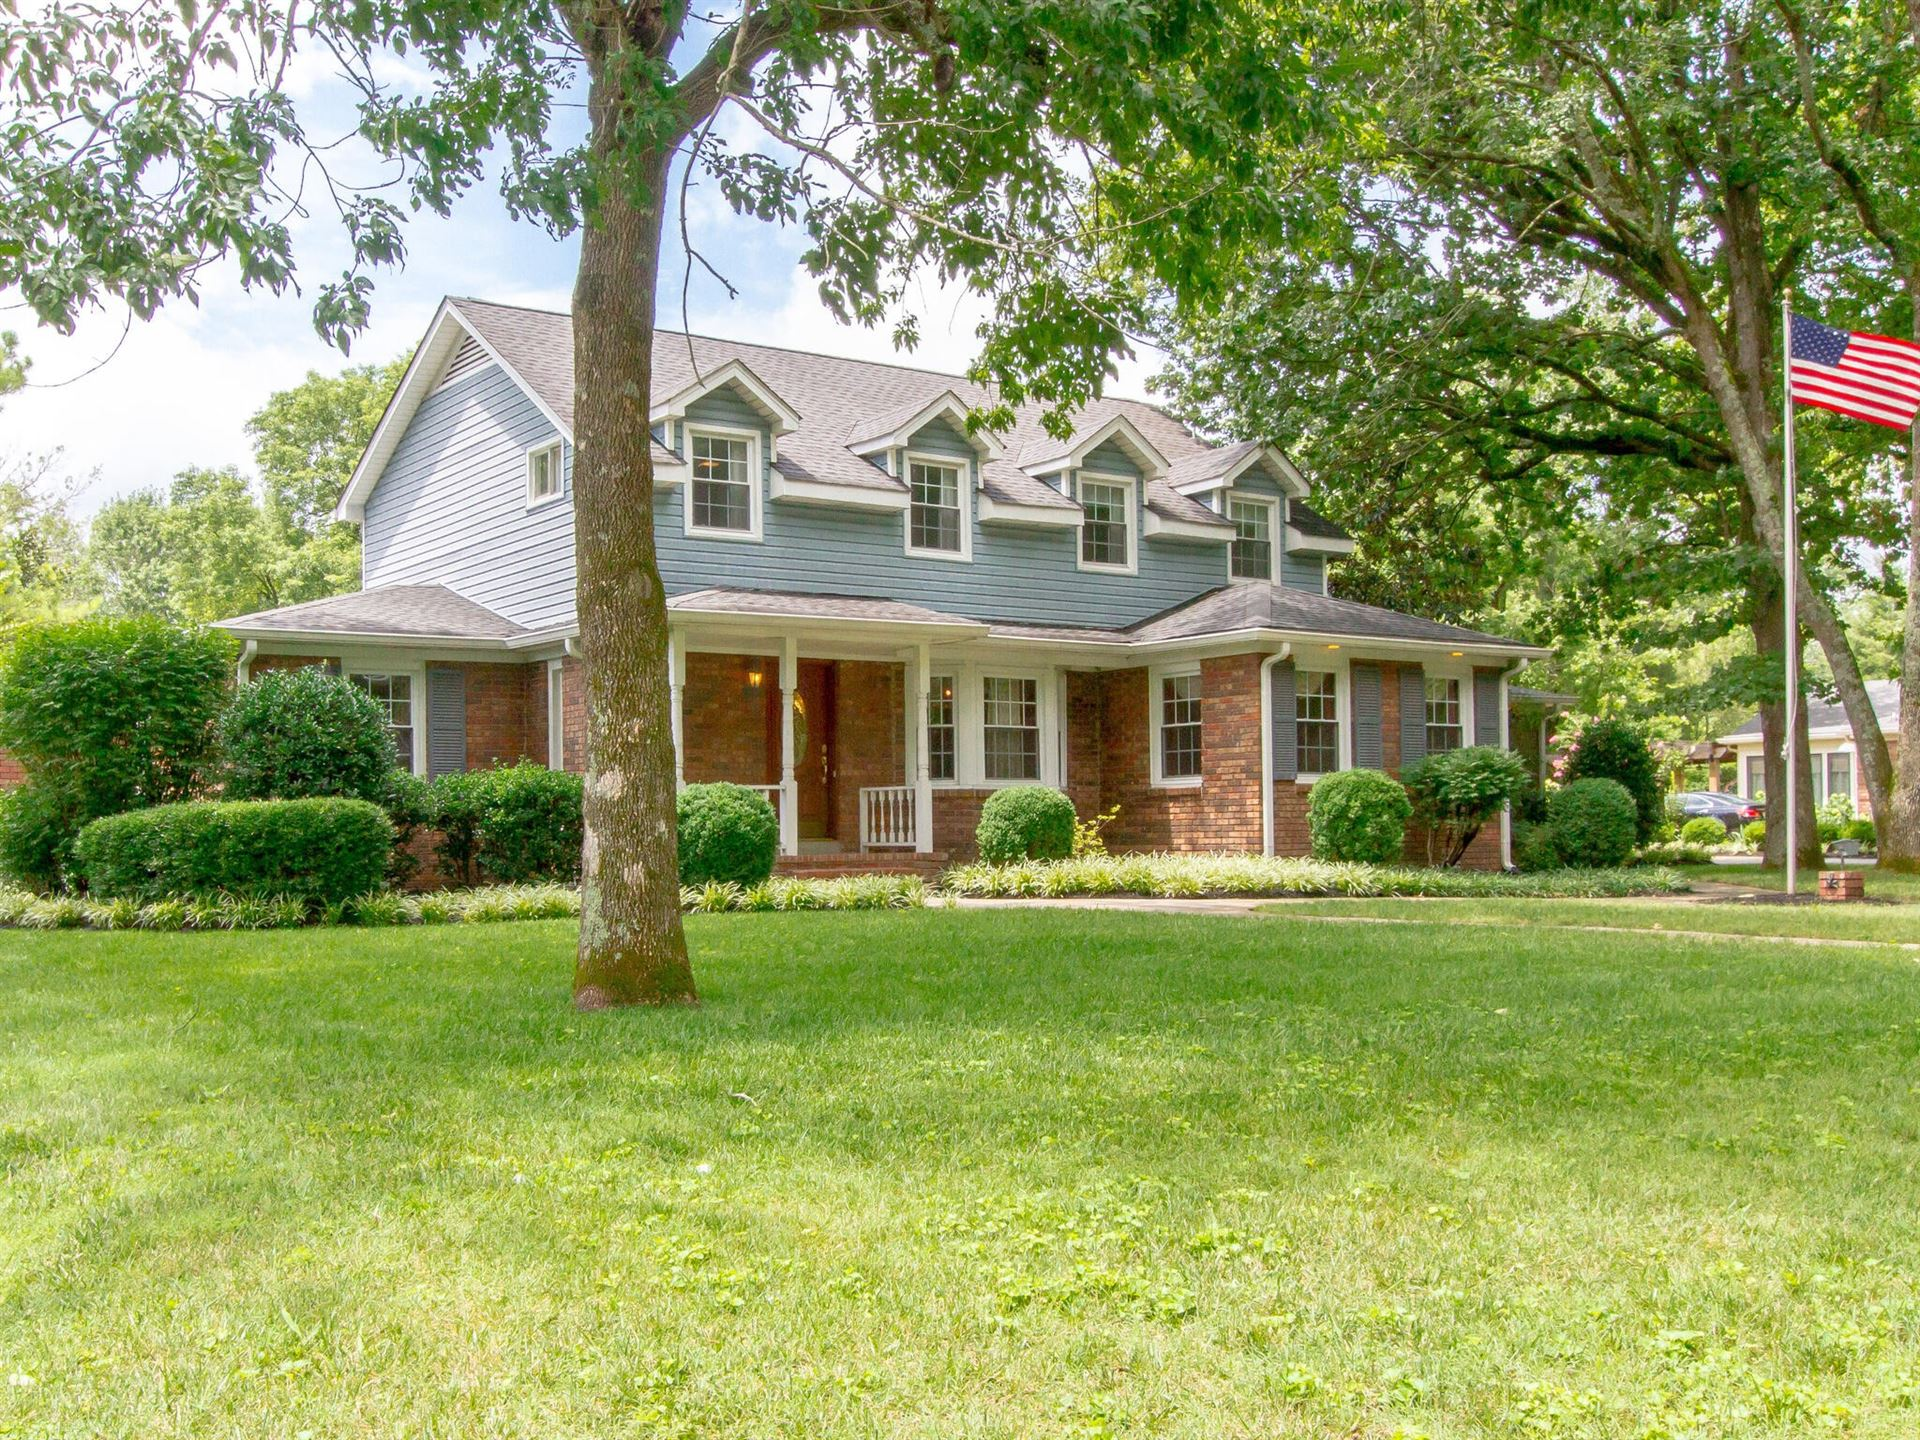 1707 Herald Ln, Murfreesboro, TN 37130 - MLS#: 2272139